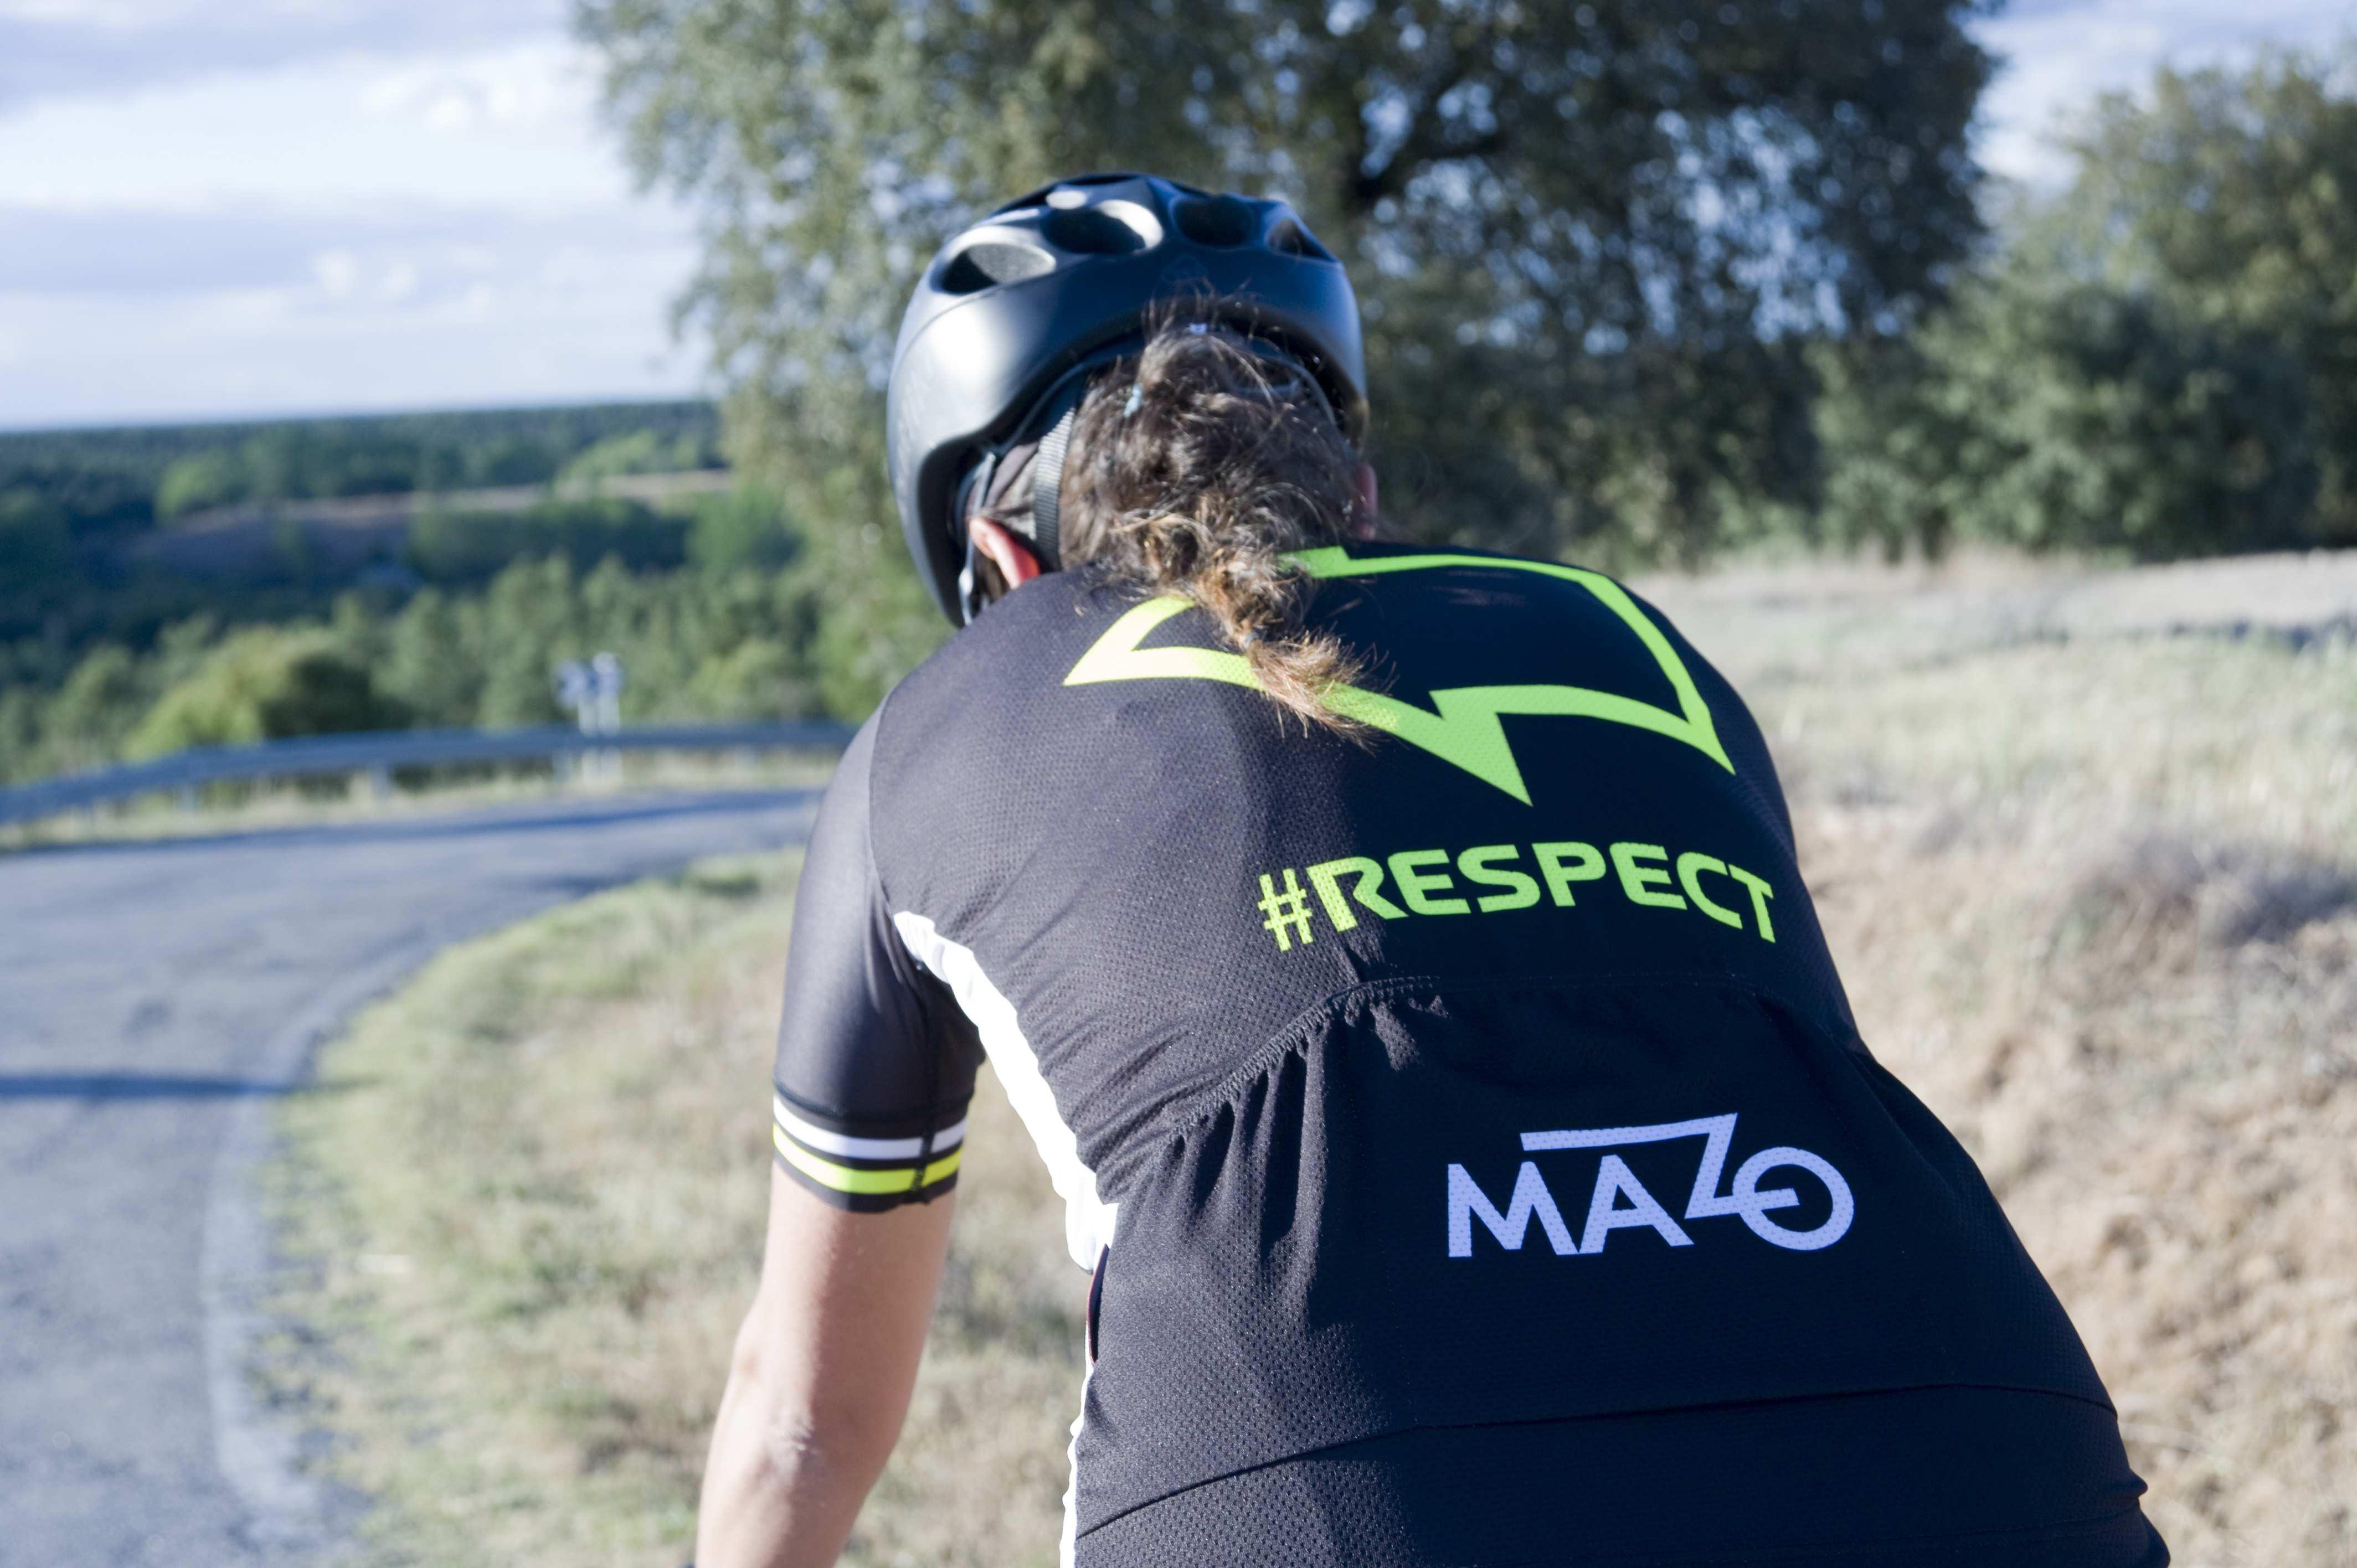 ropa ciclista #Respect tráfico